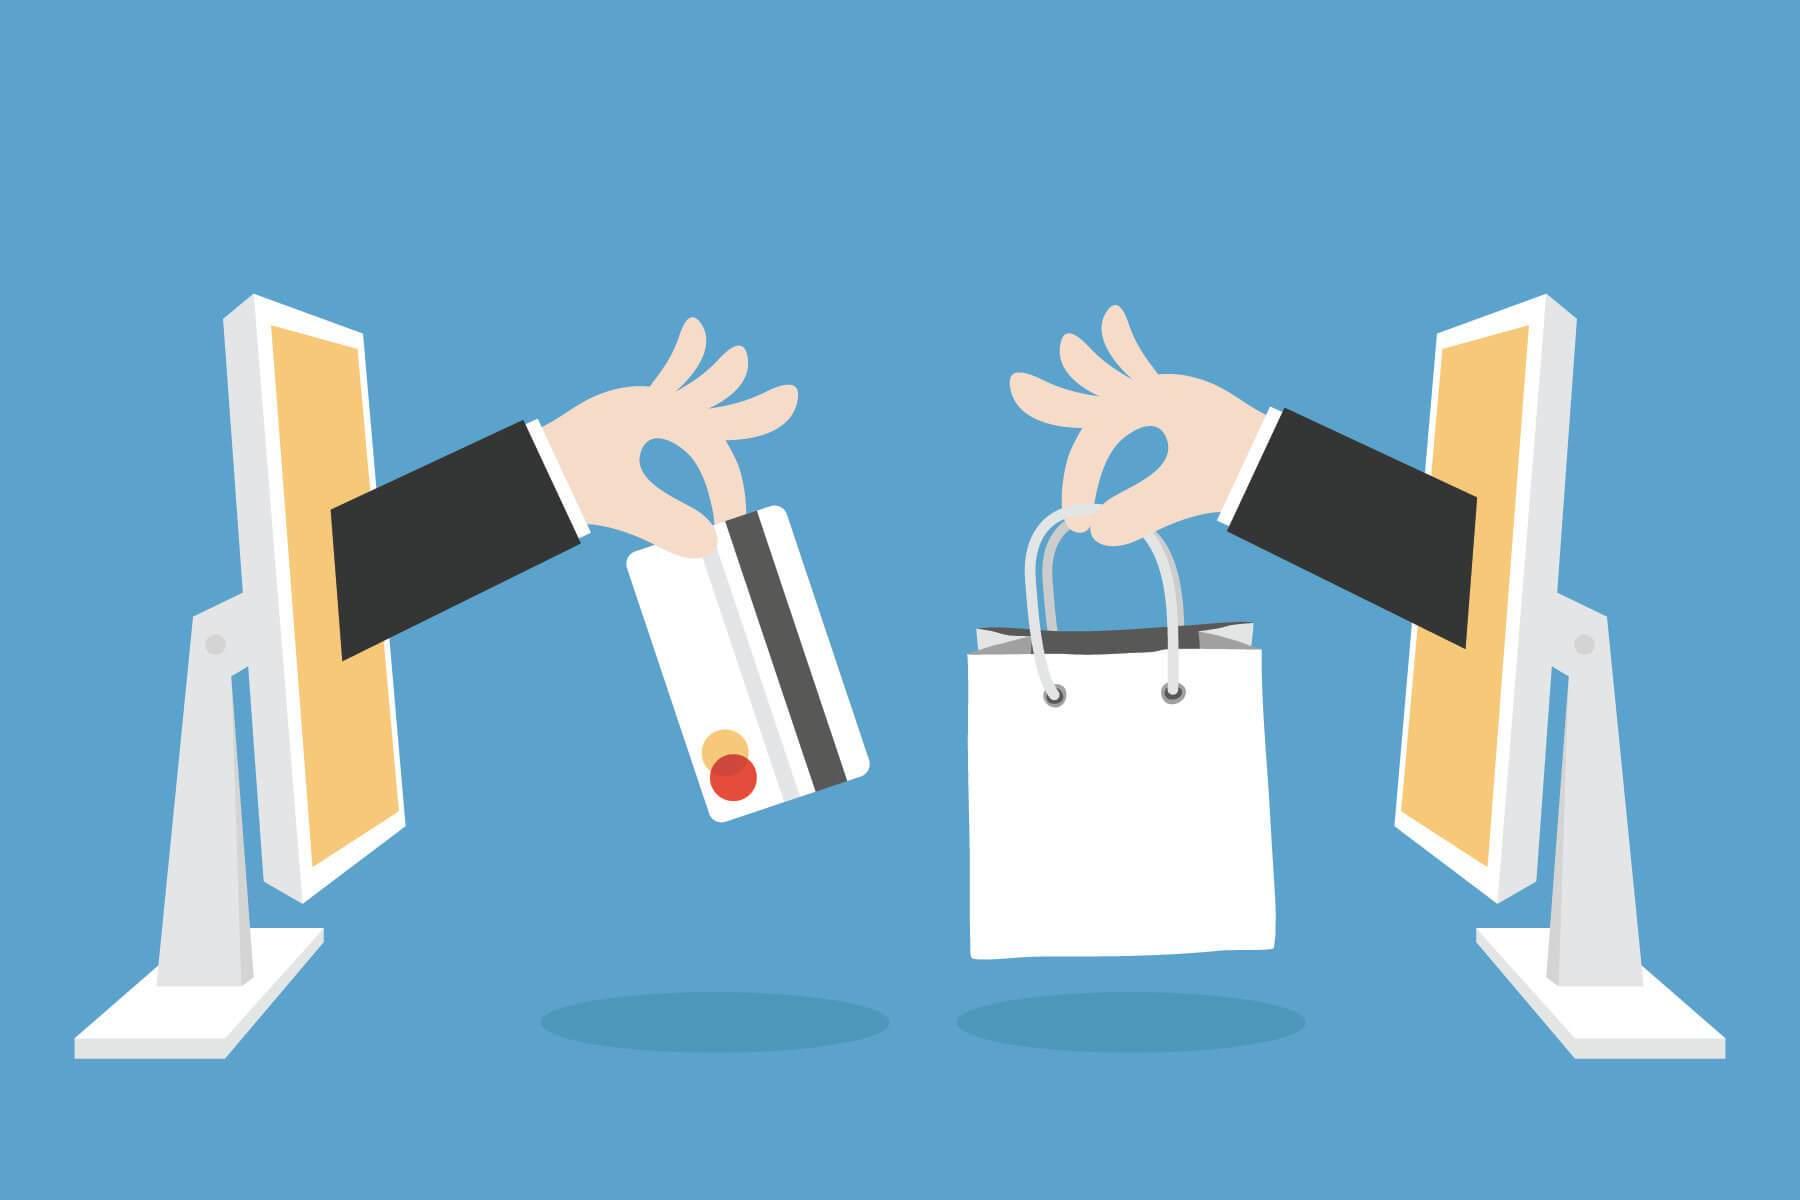 ETBİS - Elektronik Ticaret Bilgi Sistemi Elektronik Ticaret Bilgi Sistemi'ne (ETBİS) Kayıtlar Başlıyor